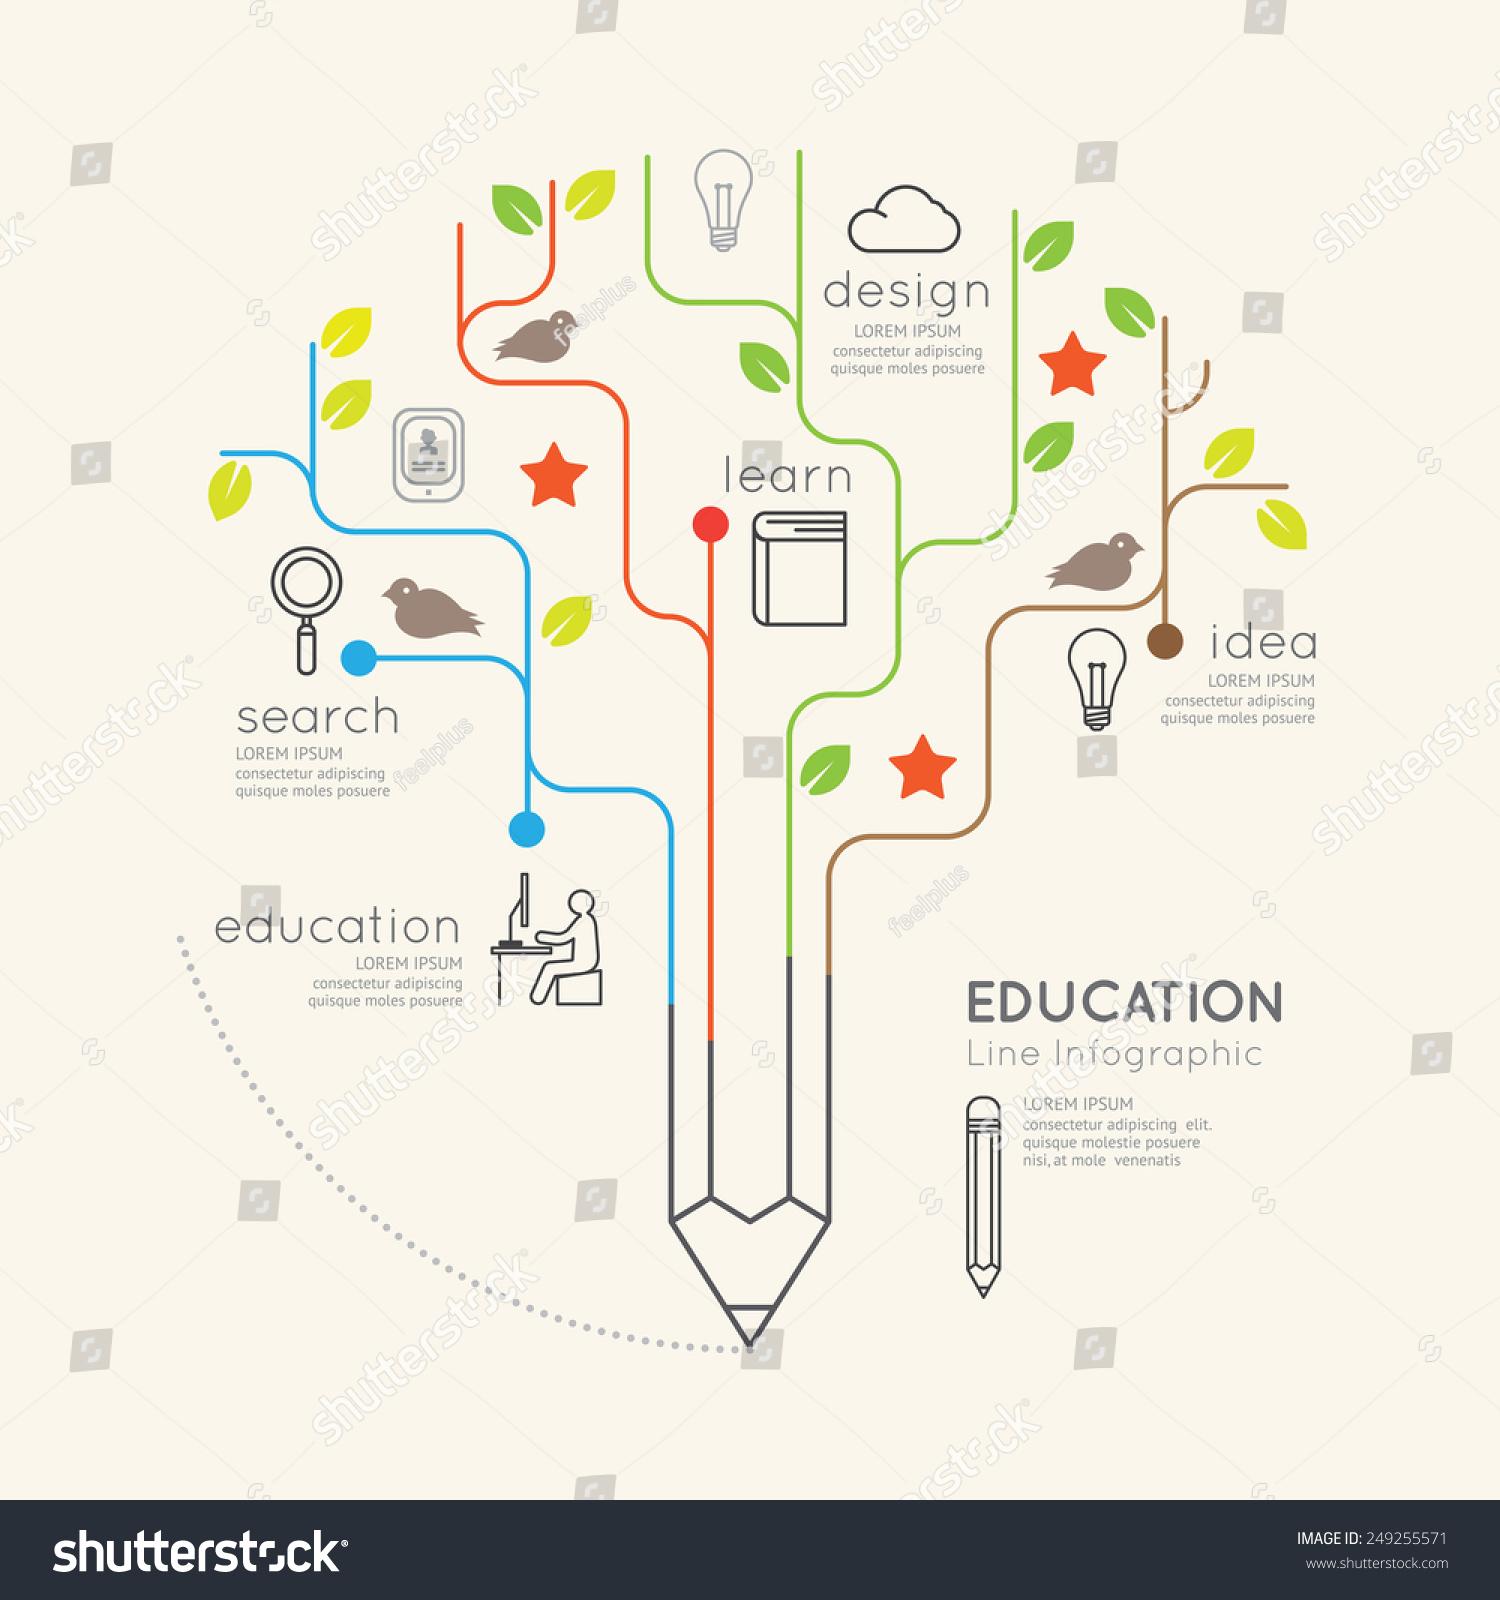 Outline the concept of holistic development